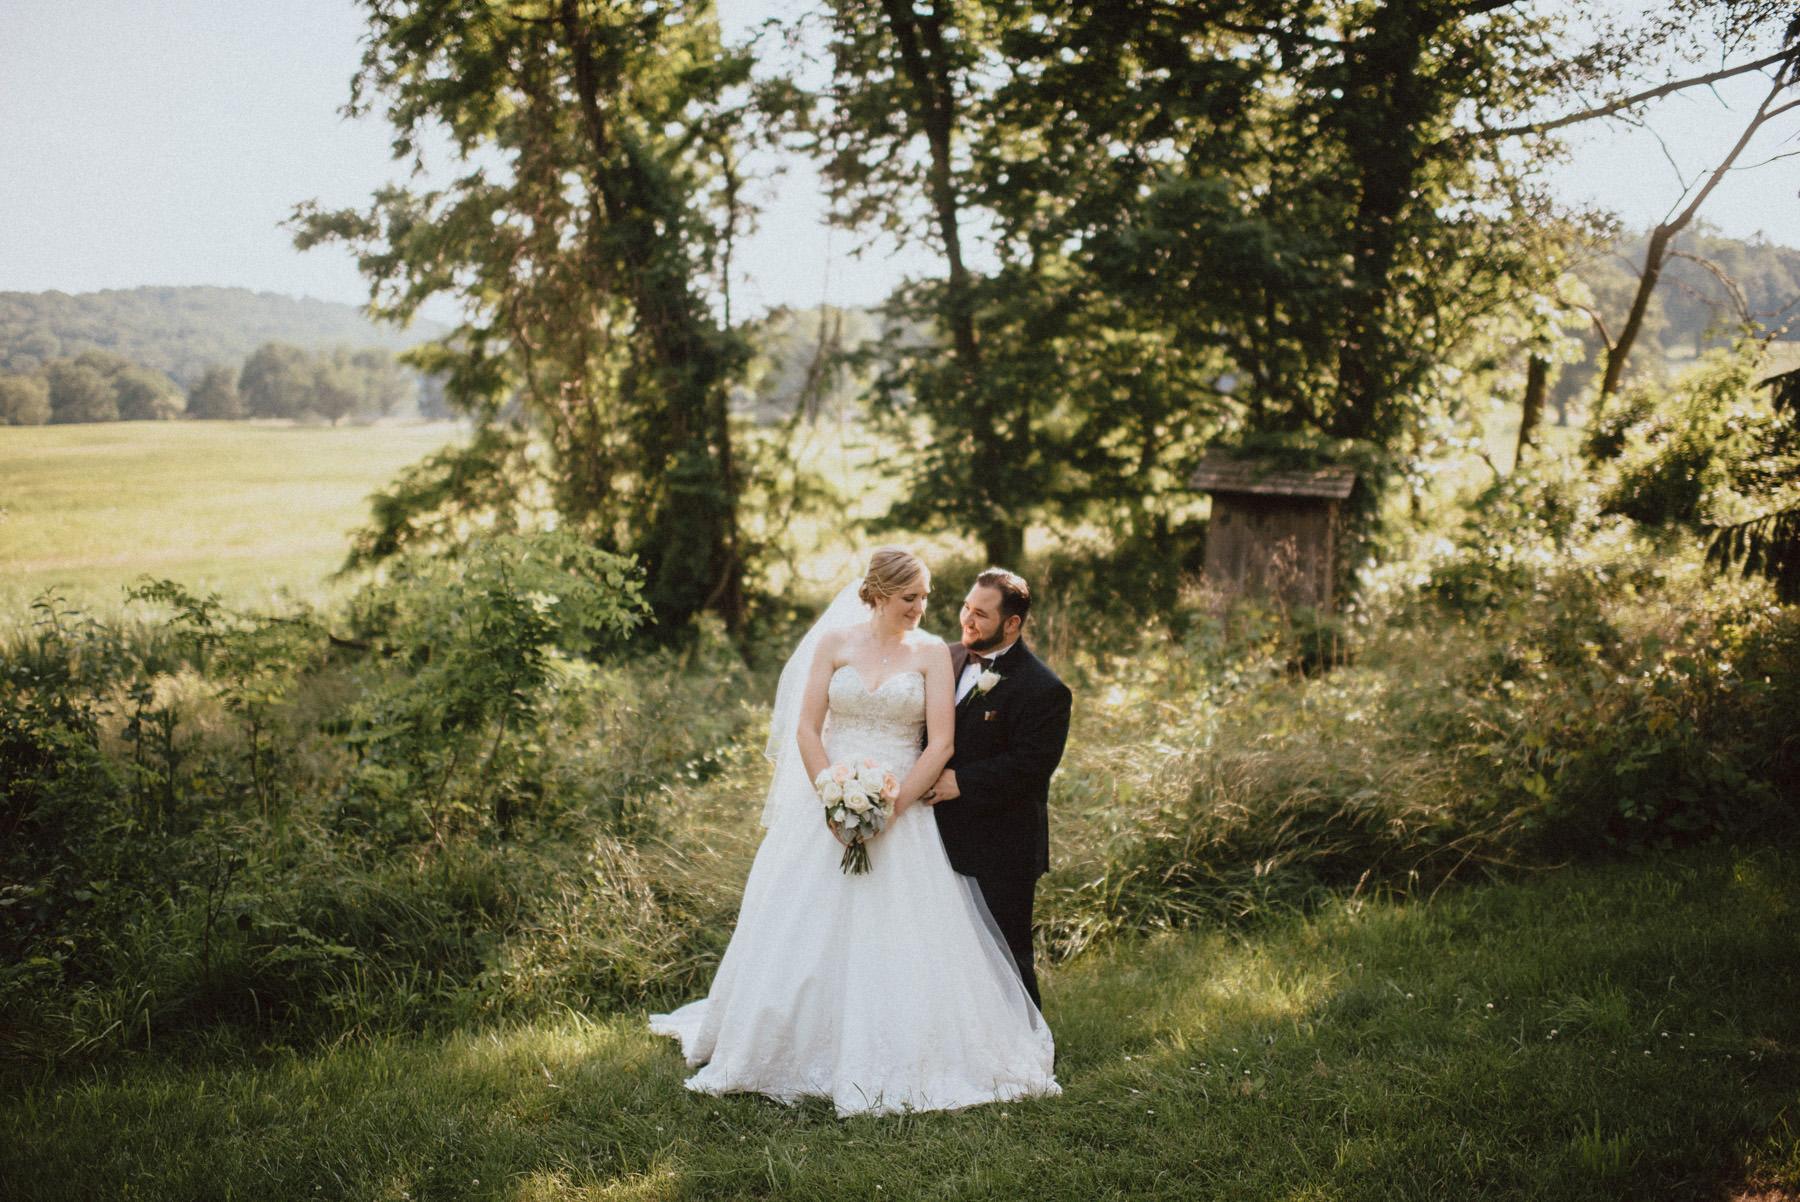 261-valley-forge-wedding-9.jpg